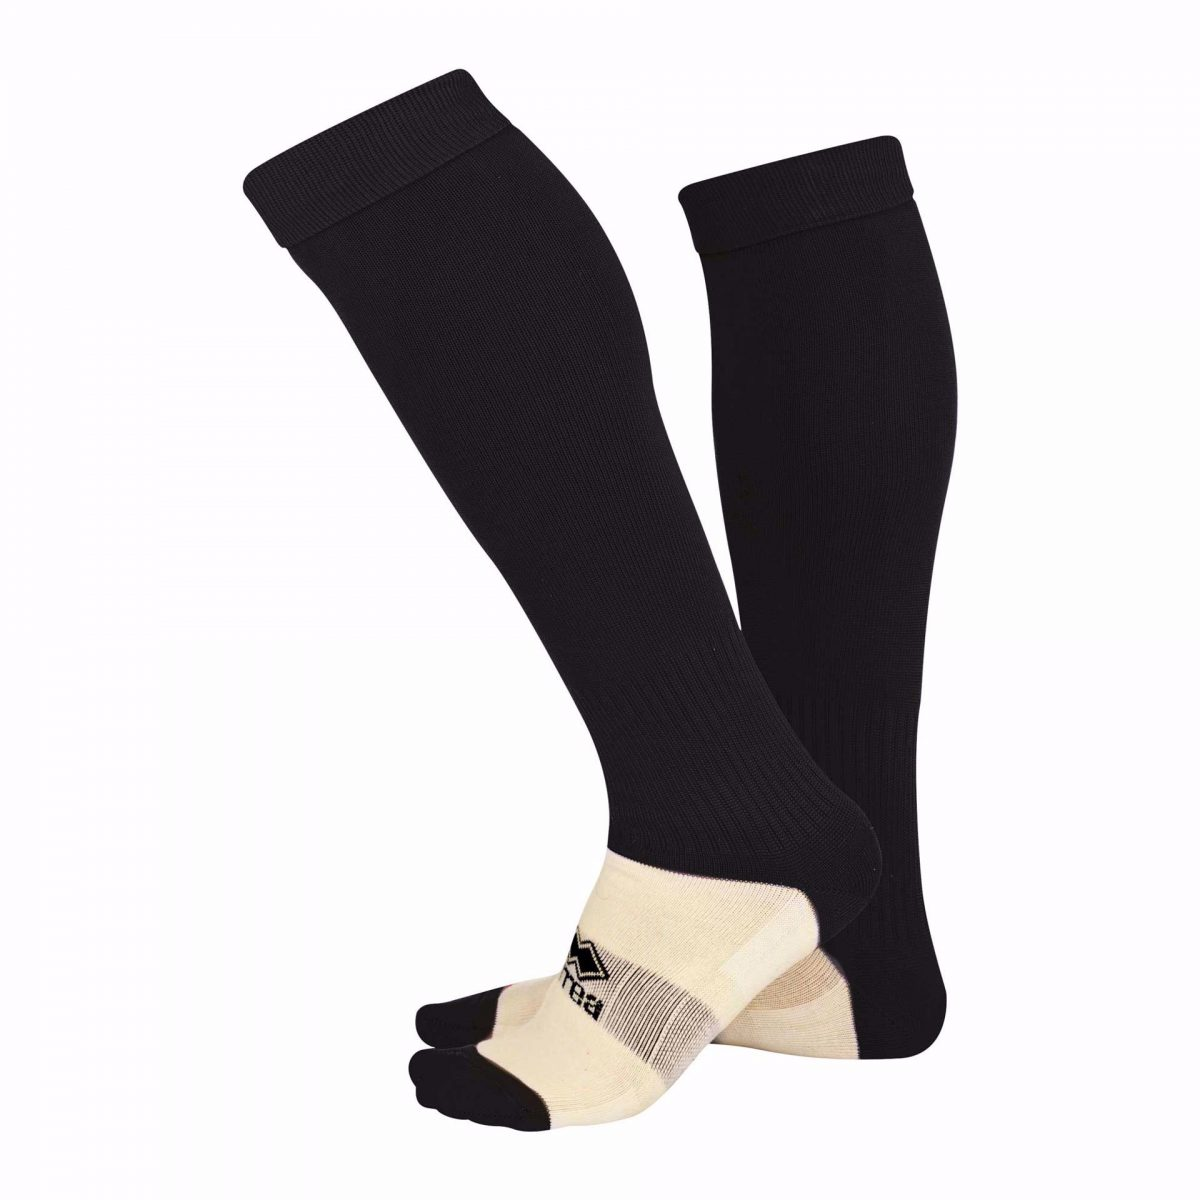 Tiverton Town Development FC Training Socks - Errea POLY A410 00012